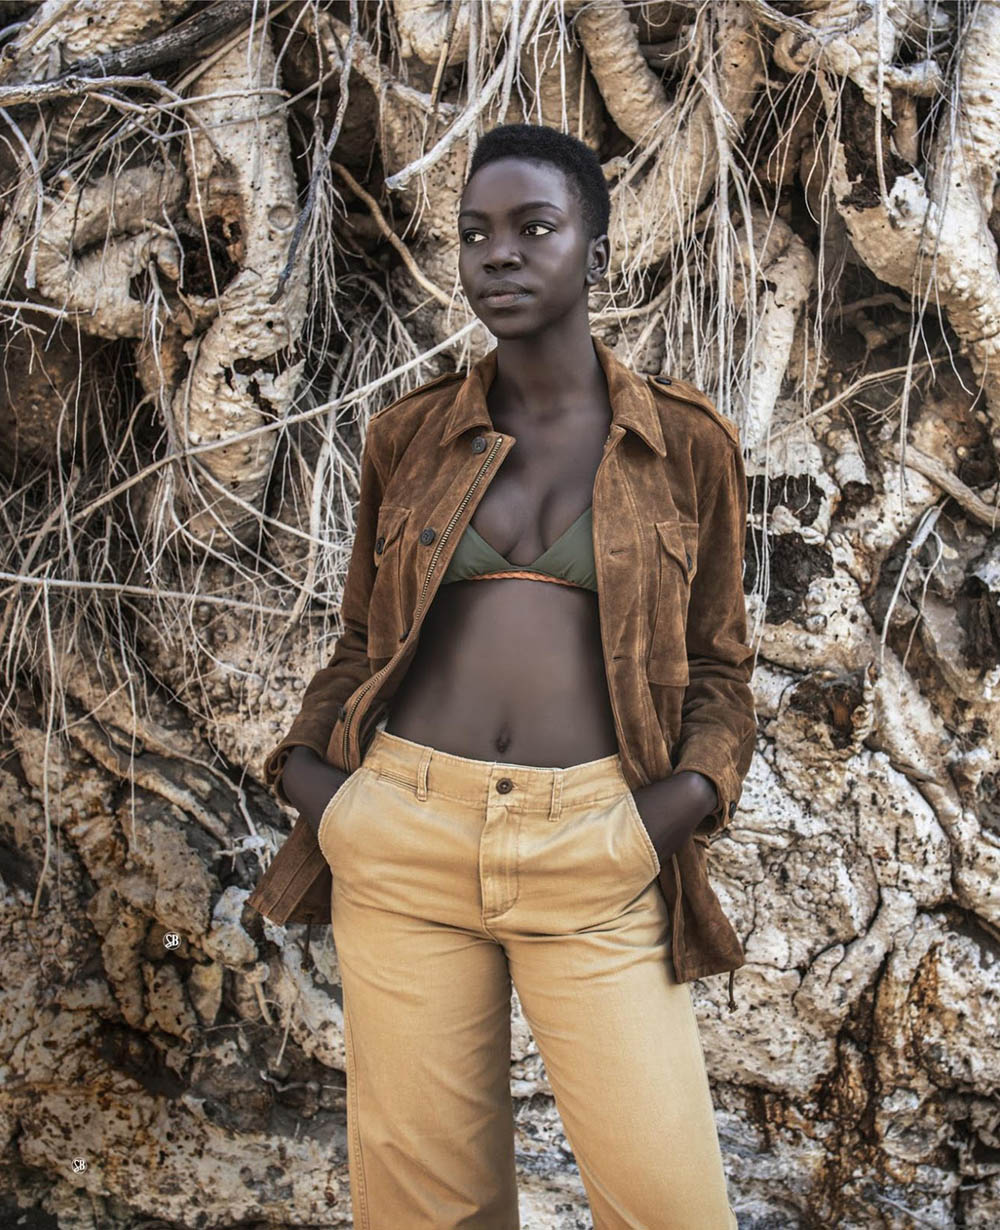 Nyamuoch Girwath by David Yarrow for Harper's Bazaar US October 2019